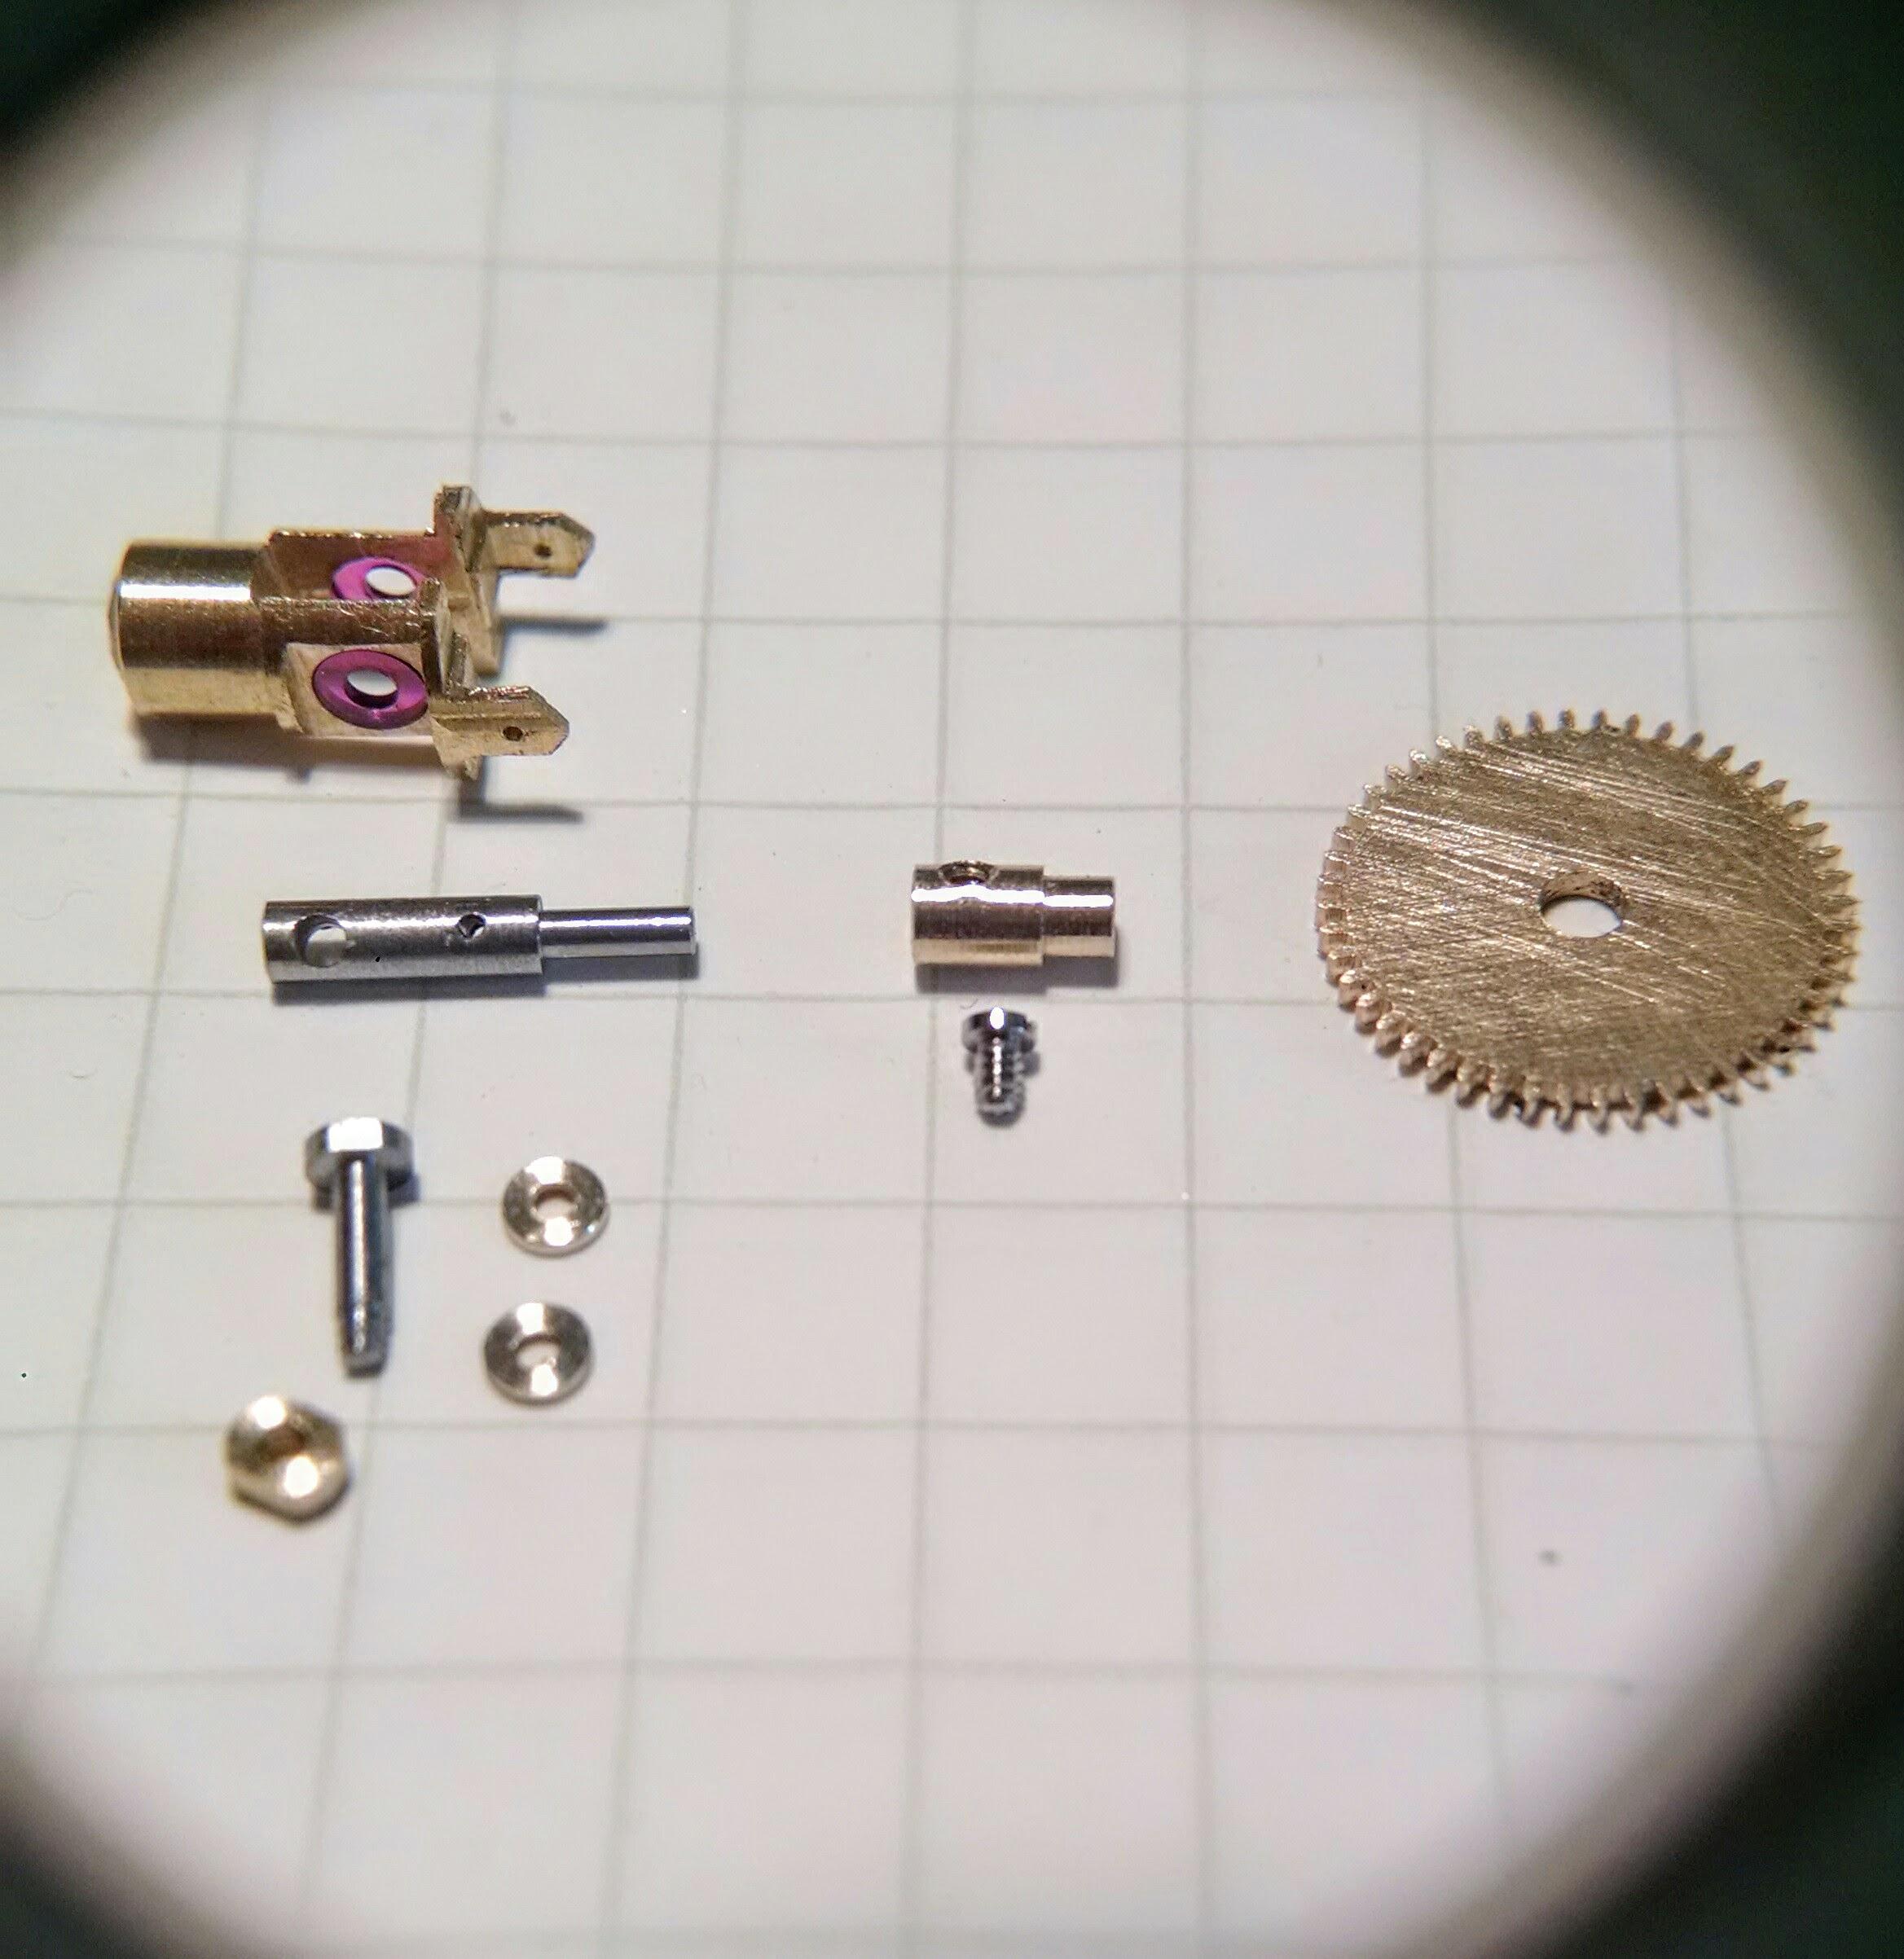 Chameleon Eye Mechanism Parts